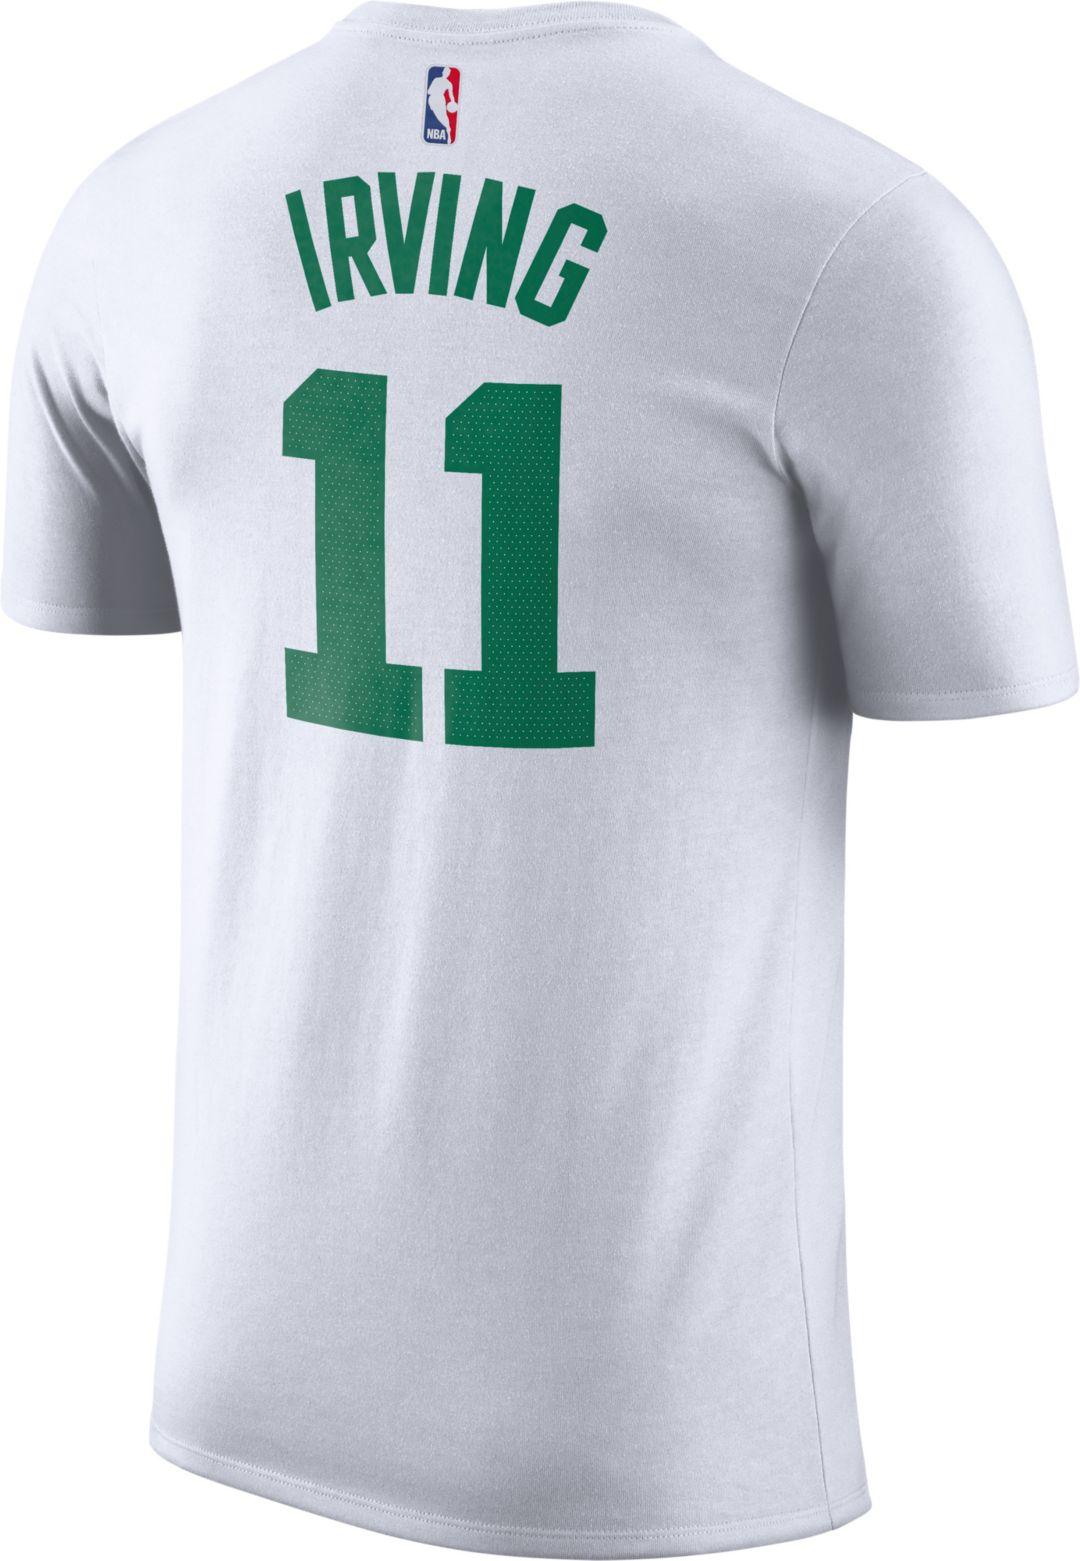 ab97ad7ce Nike Men's Boston Celtics Kyrie Irving #11 Dri-FIT White T-Shirt.  noImageFound. Previous. 1. 2. 3